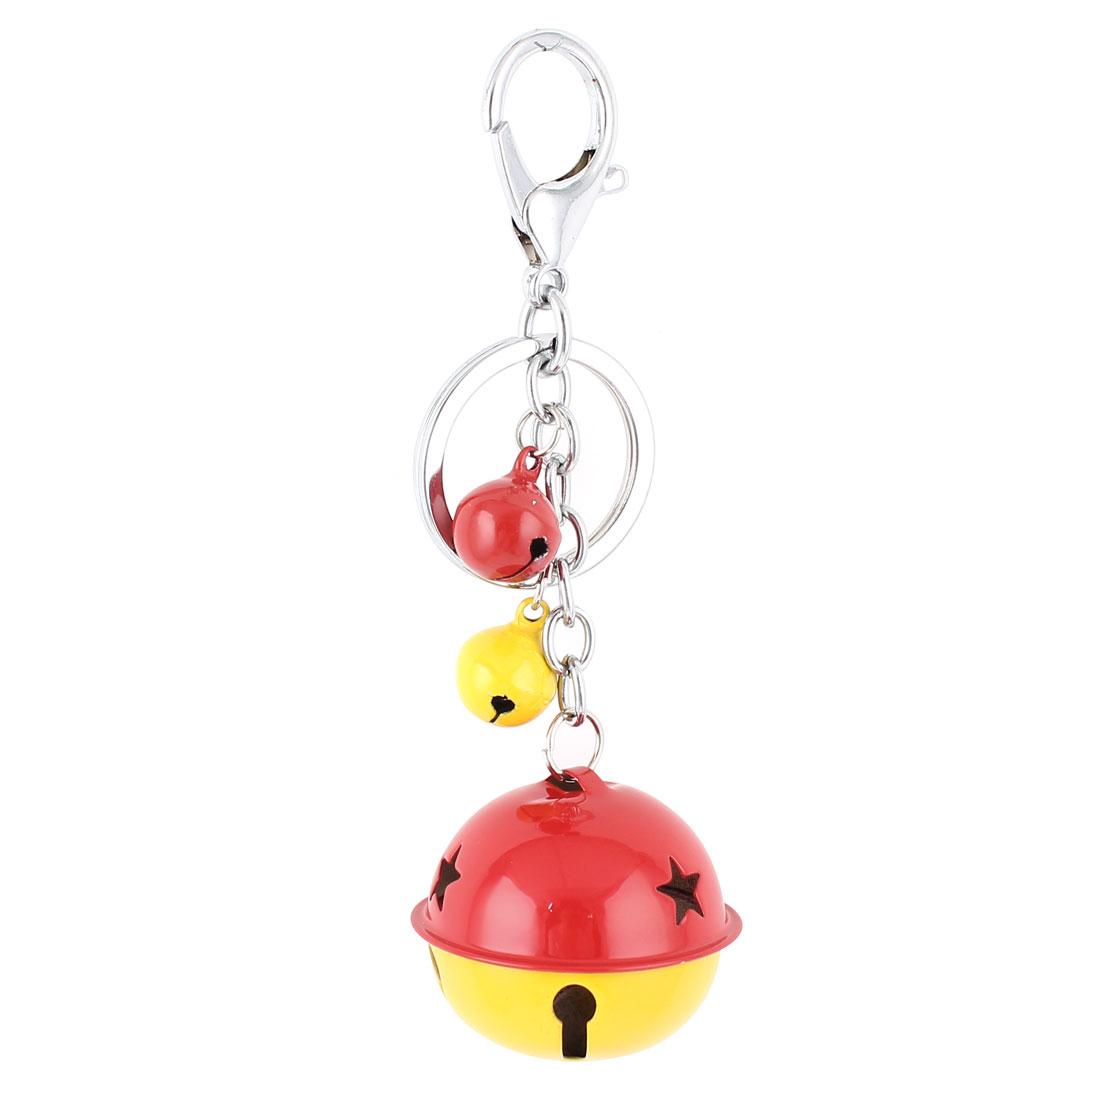 Metal Bells Pendant Lobster Clasp Split Ring Keyring Keychain Key Chain Bag Purse Ornament Yellow Red